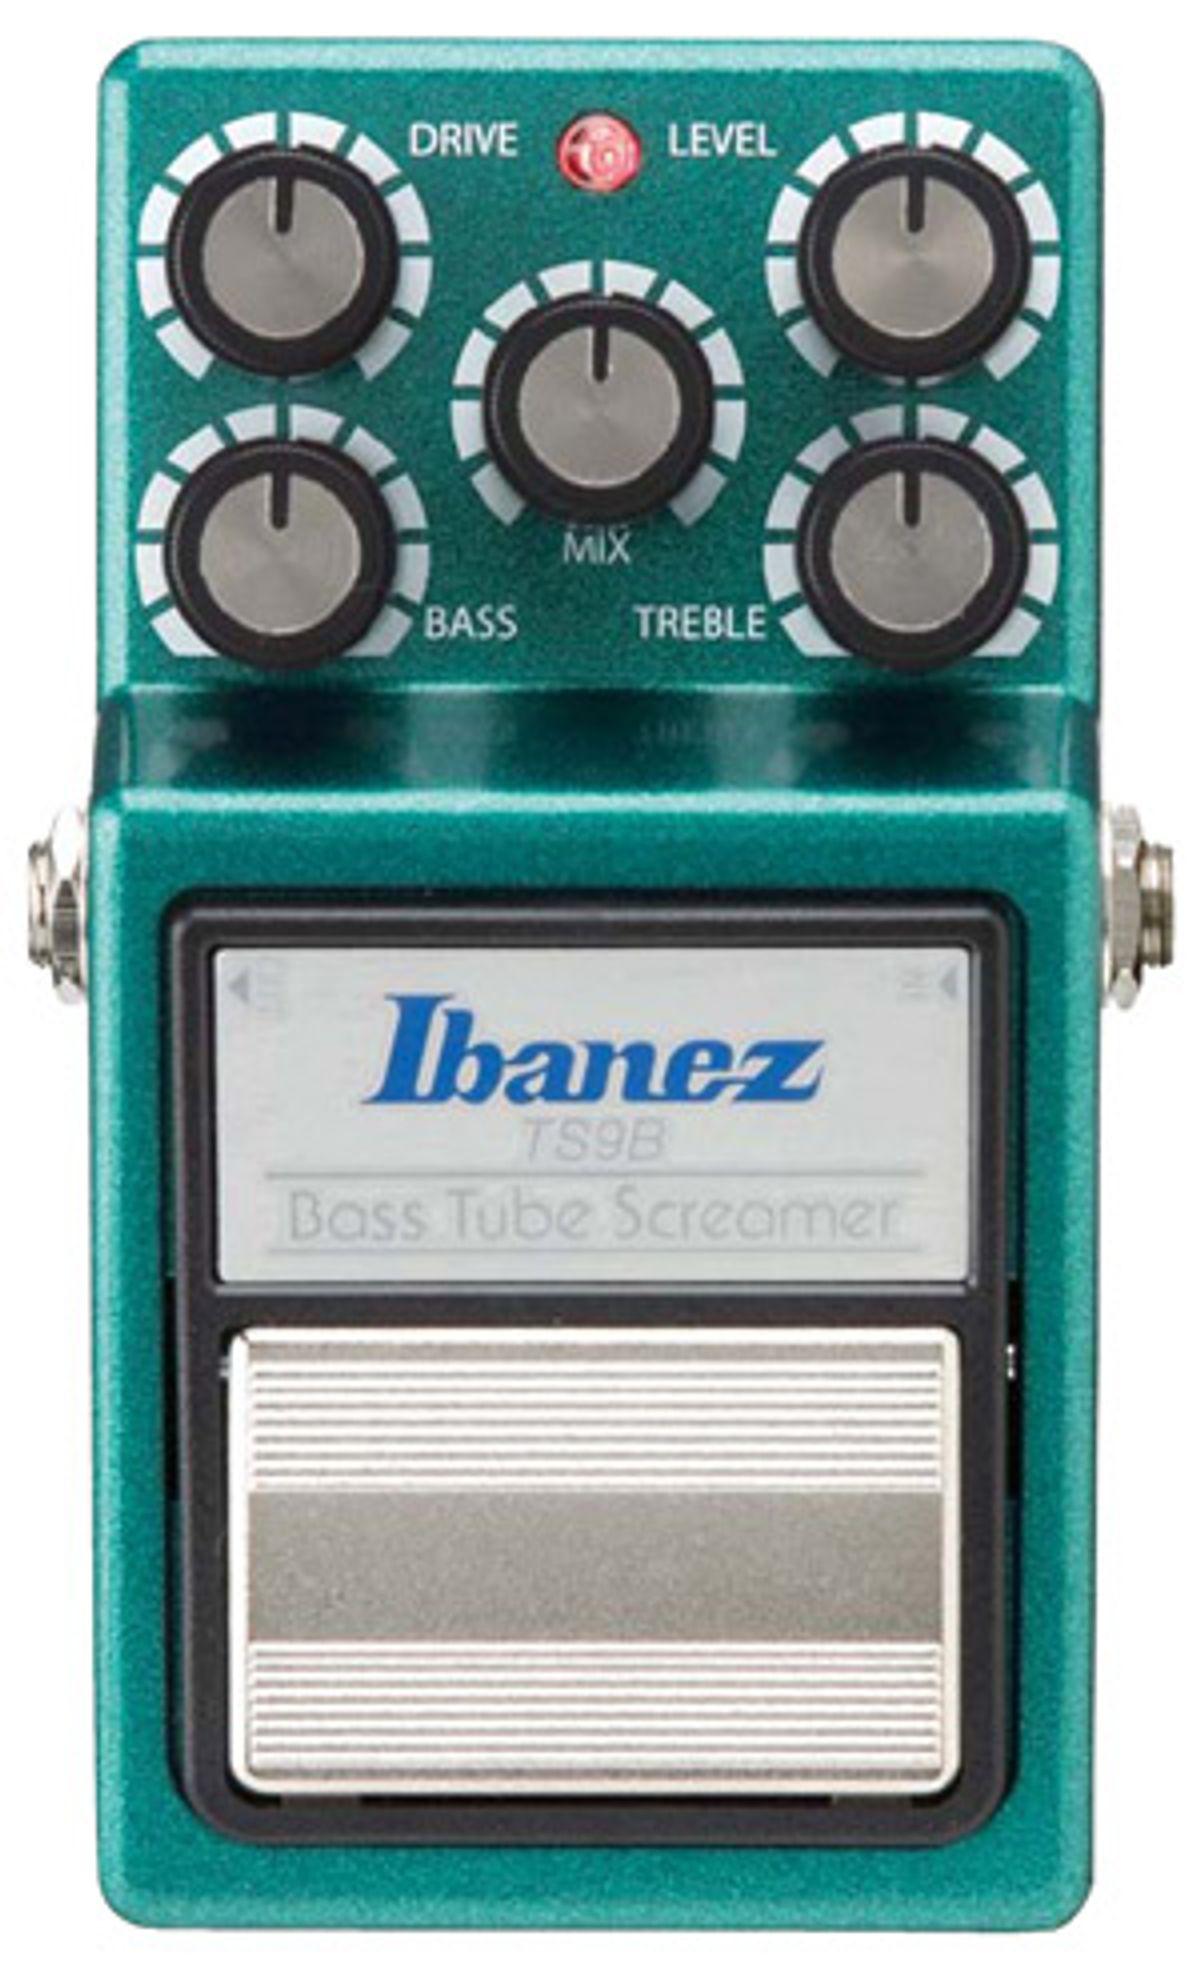 Ibanez TS9B Bass Tube Screamer Pedal Review